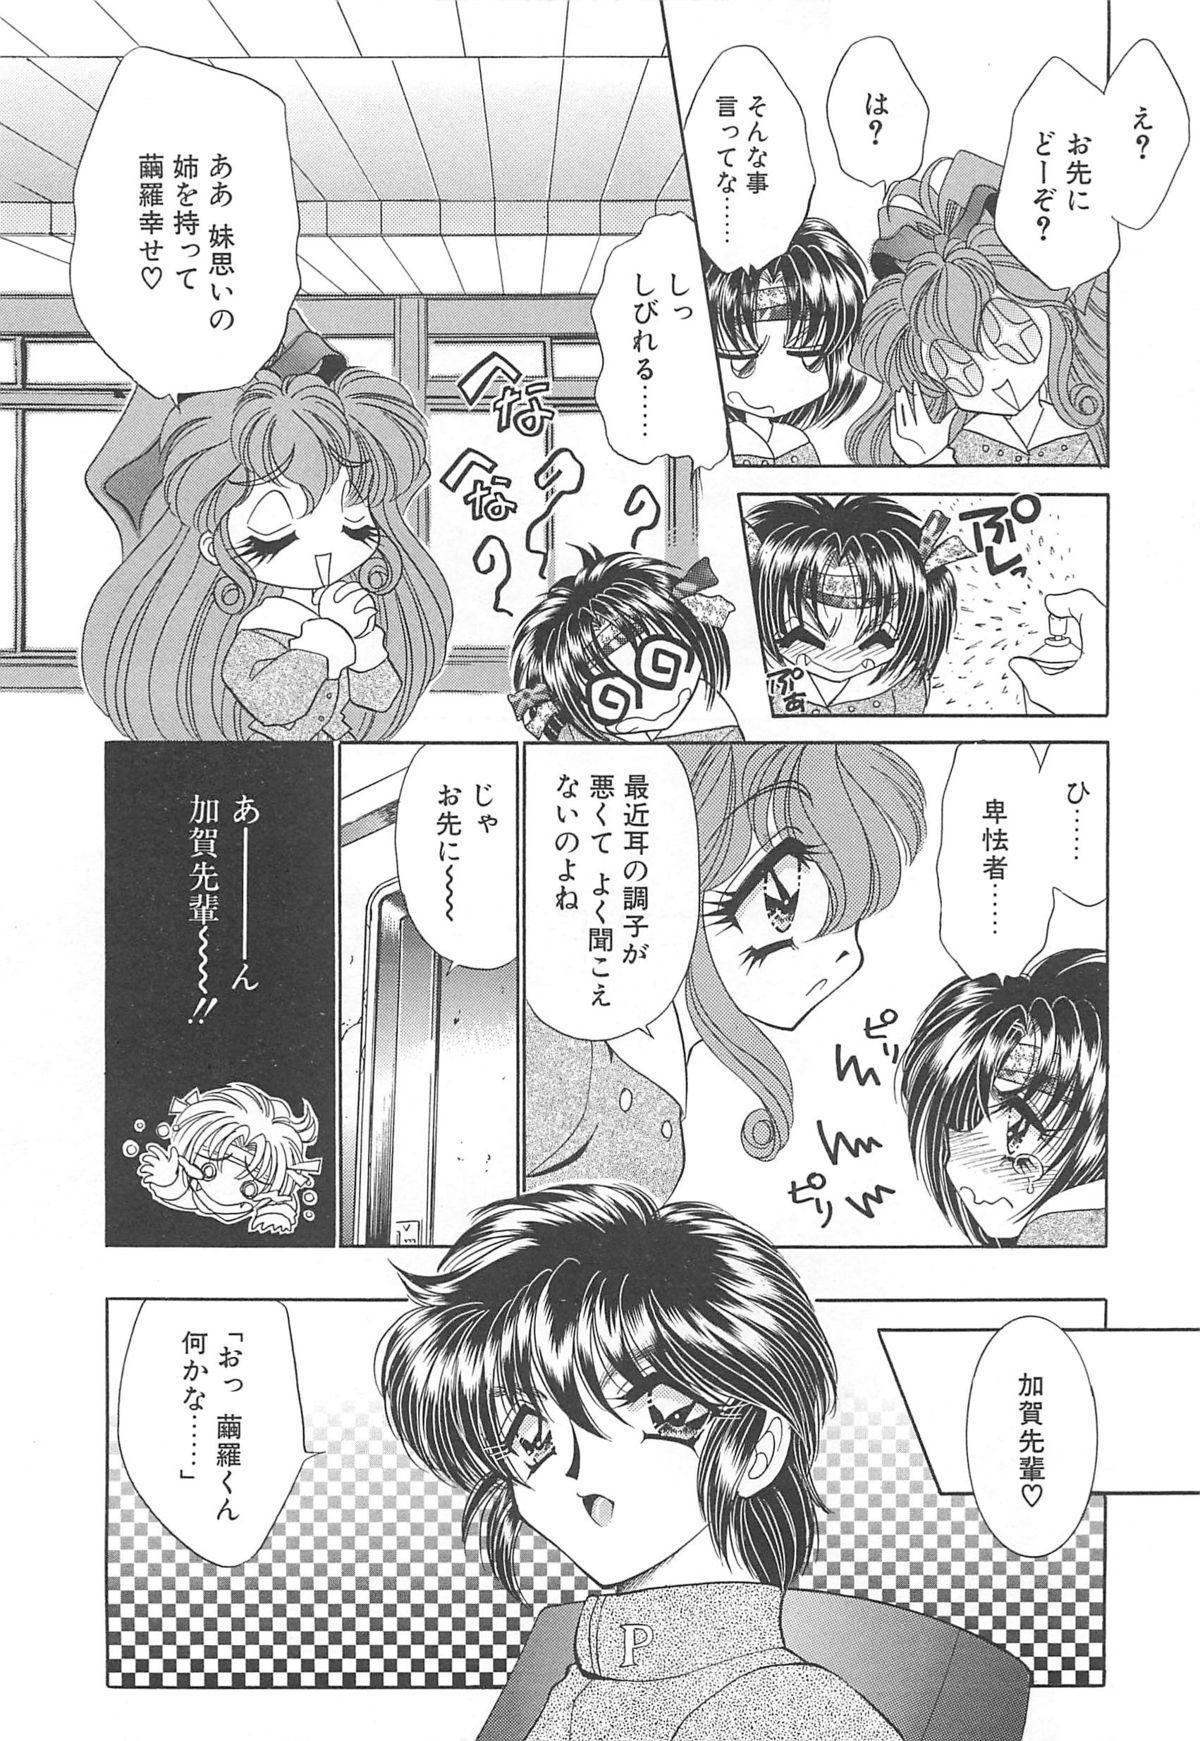 Kigurumi Sentai Quiltian 114